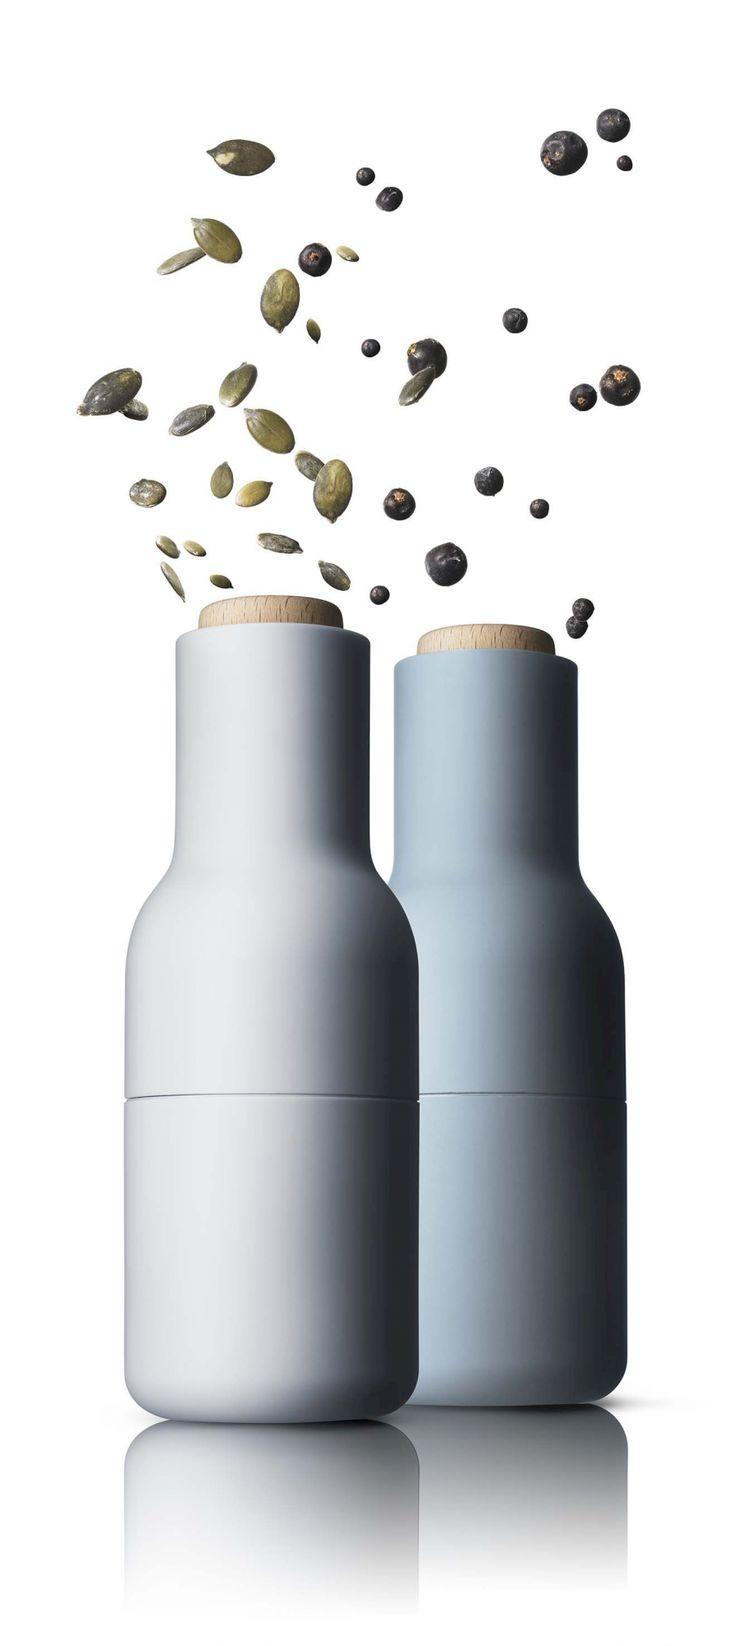 Zestaw młynków do przypraw (Blue) - DECO Salon. Simple, minimalist shape and pleasant colors, enrich each tableware. #menu #kitchenaccessories #kuchnia #pepper #salt #design